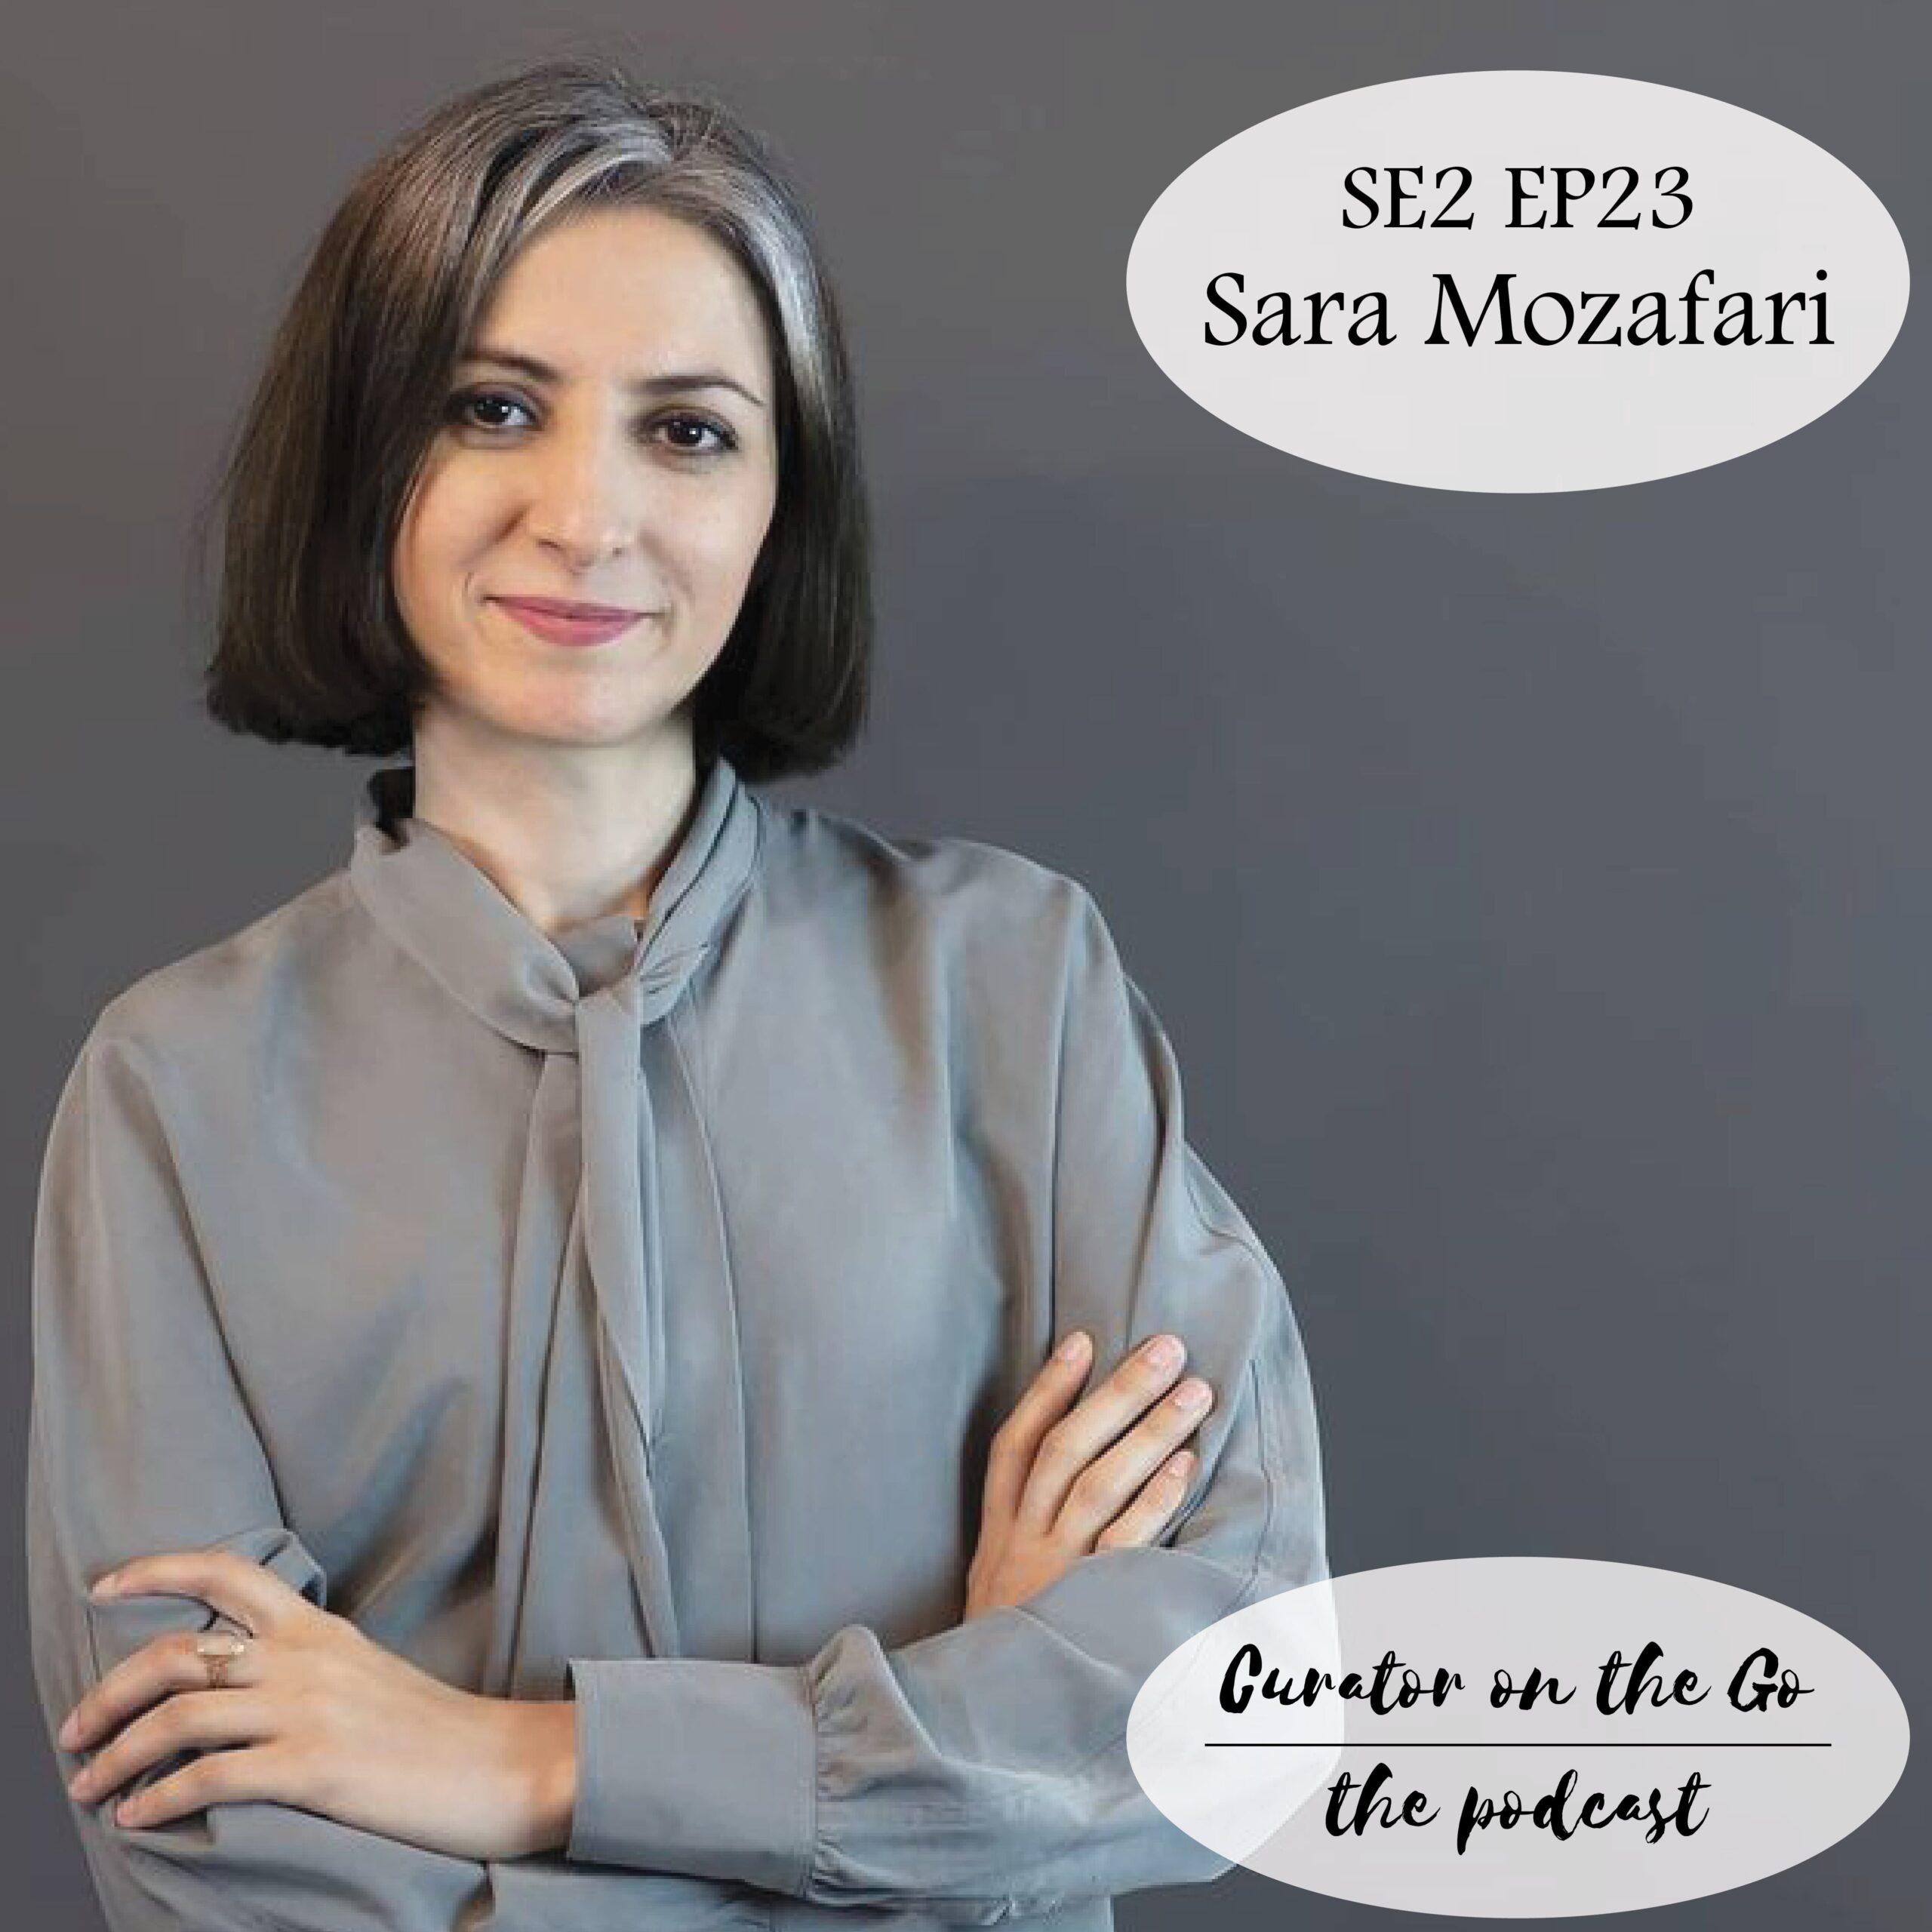 Sara Mozafari